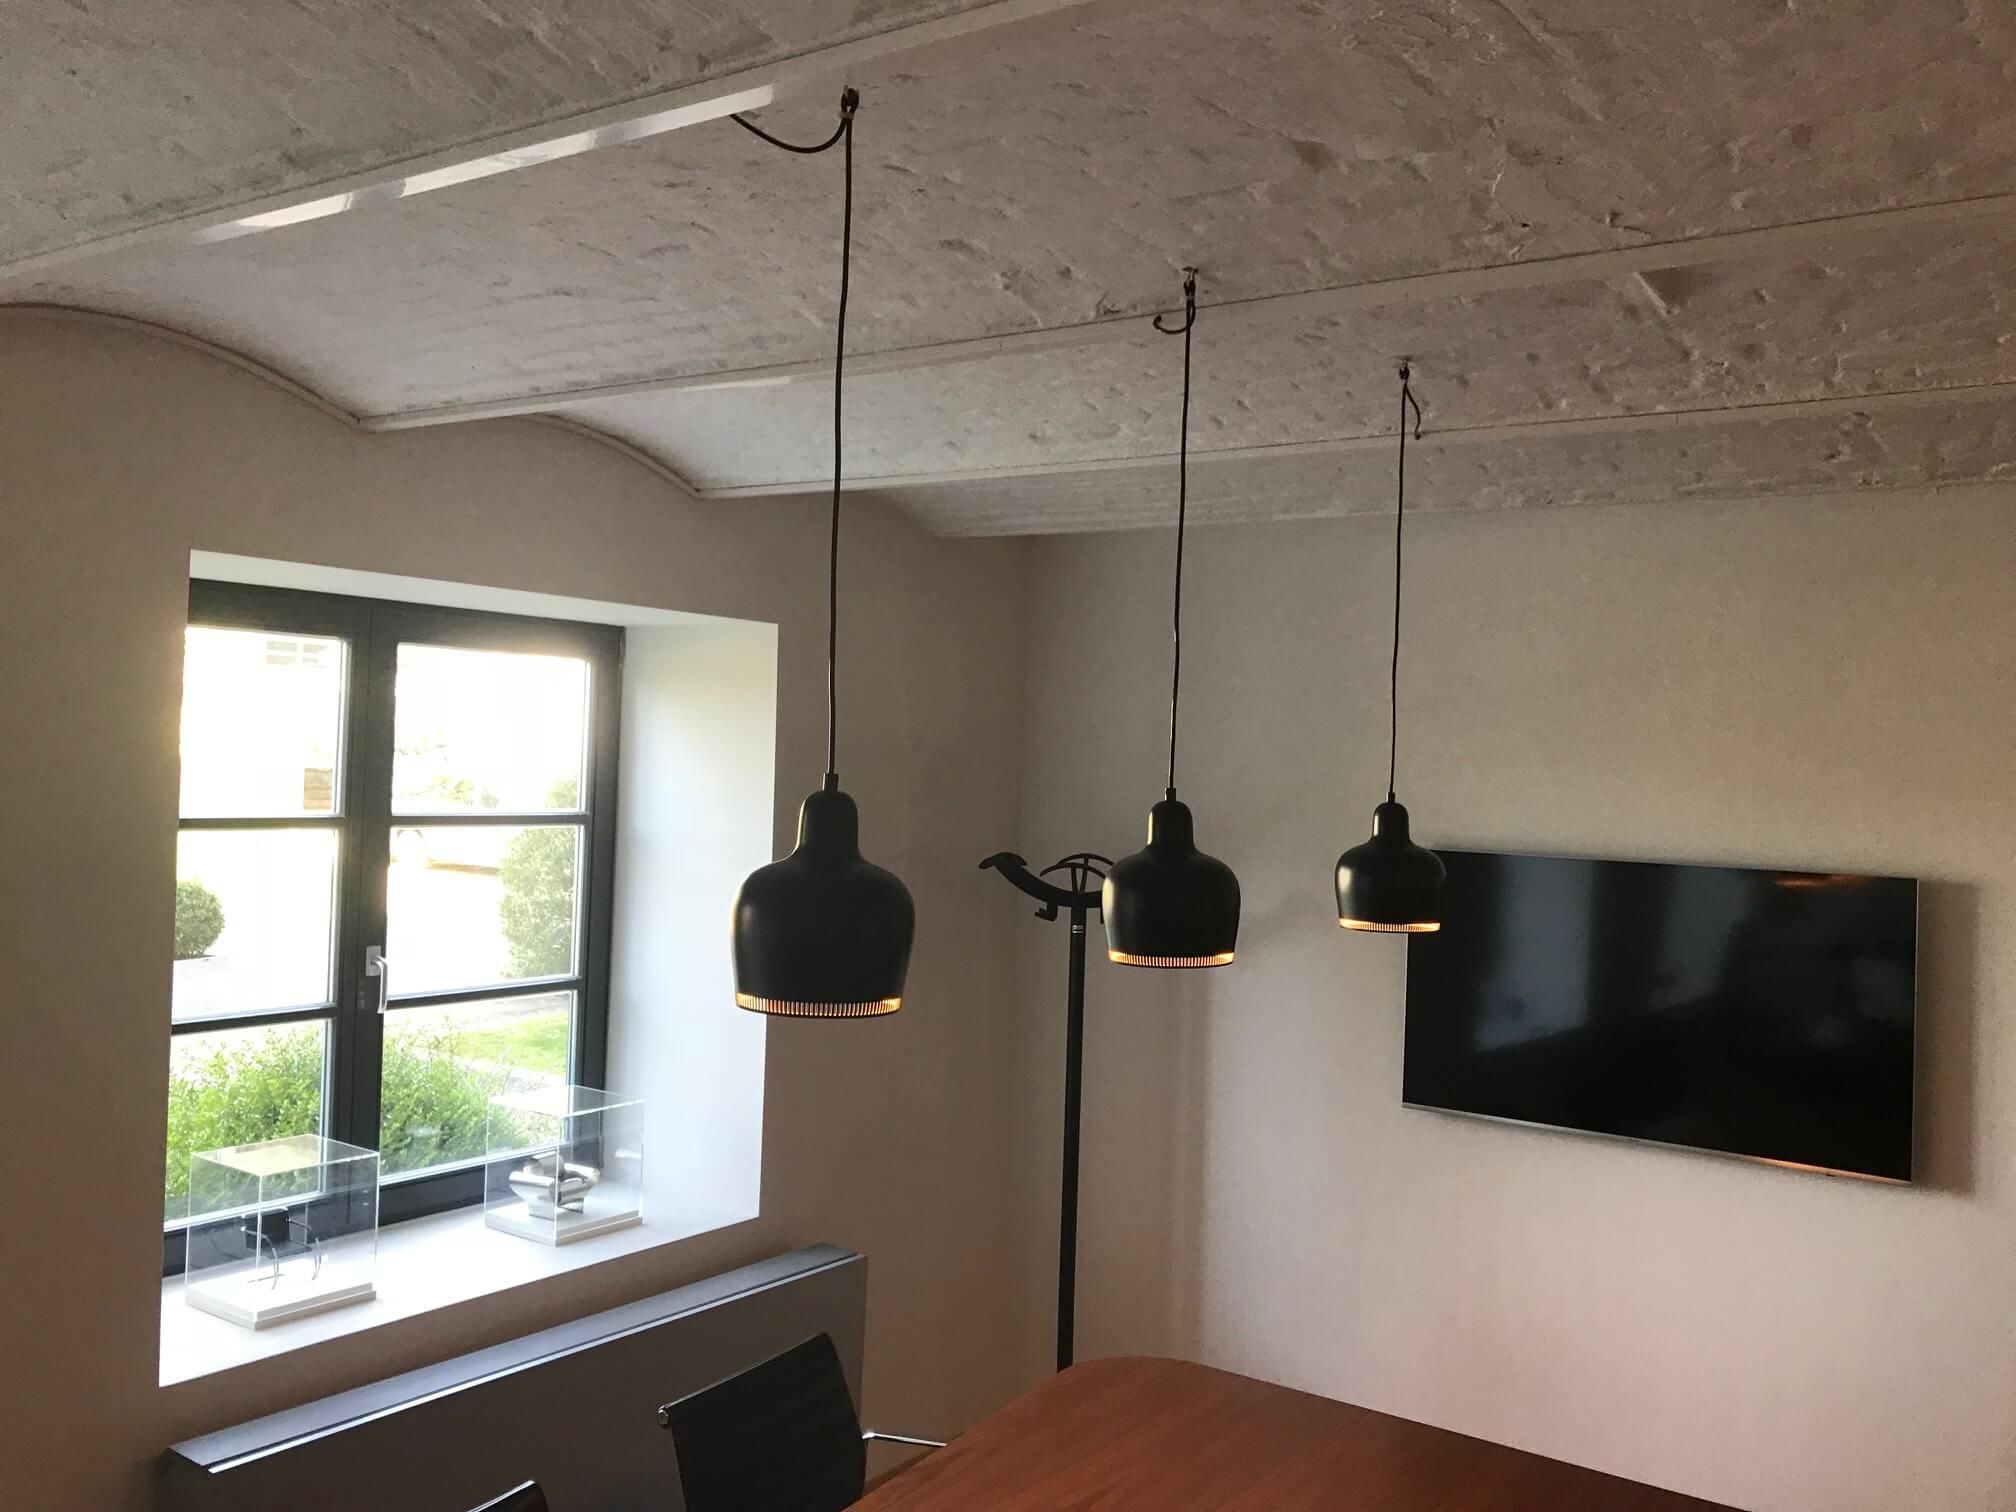 bureau-eclairage-galerie-electricite-vanhoyesprl